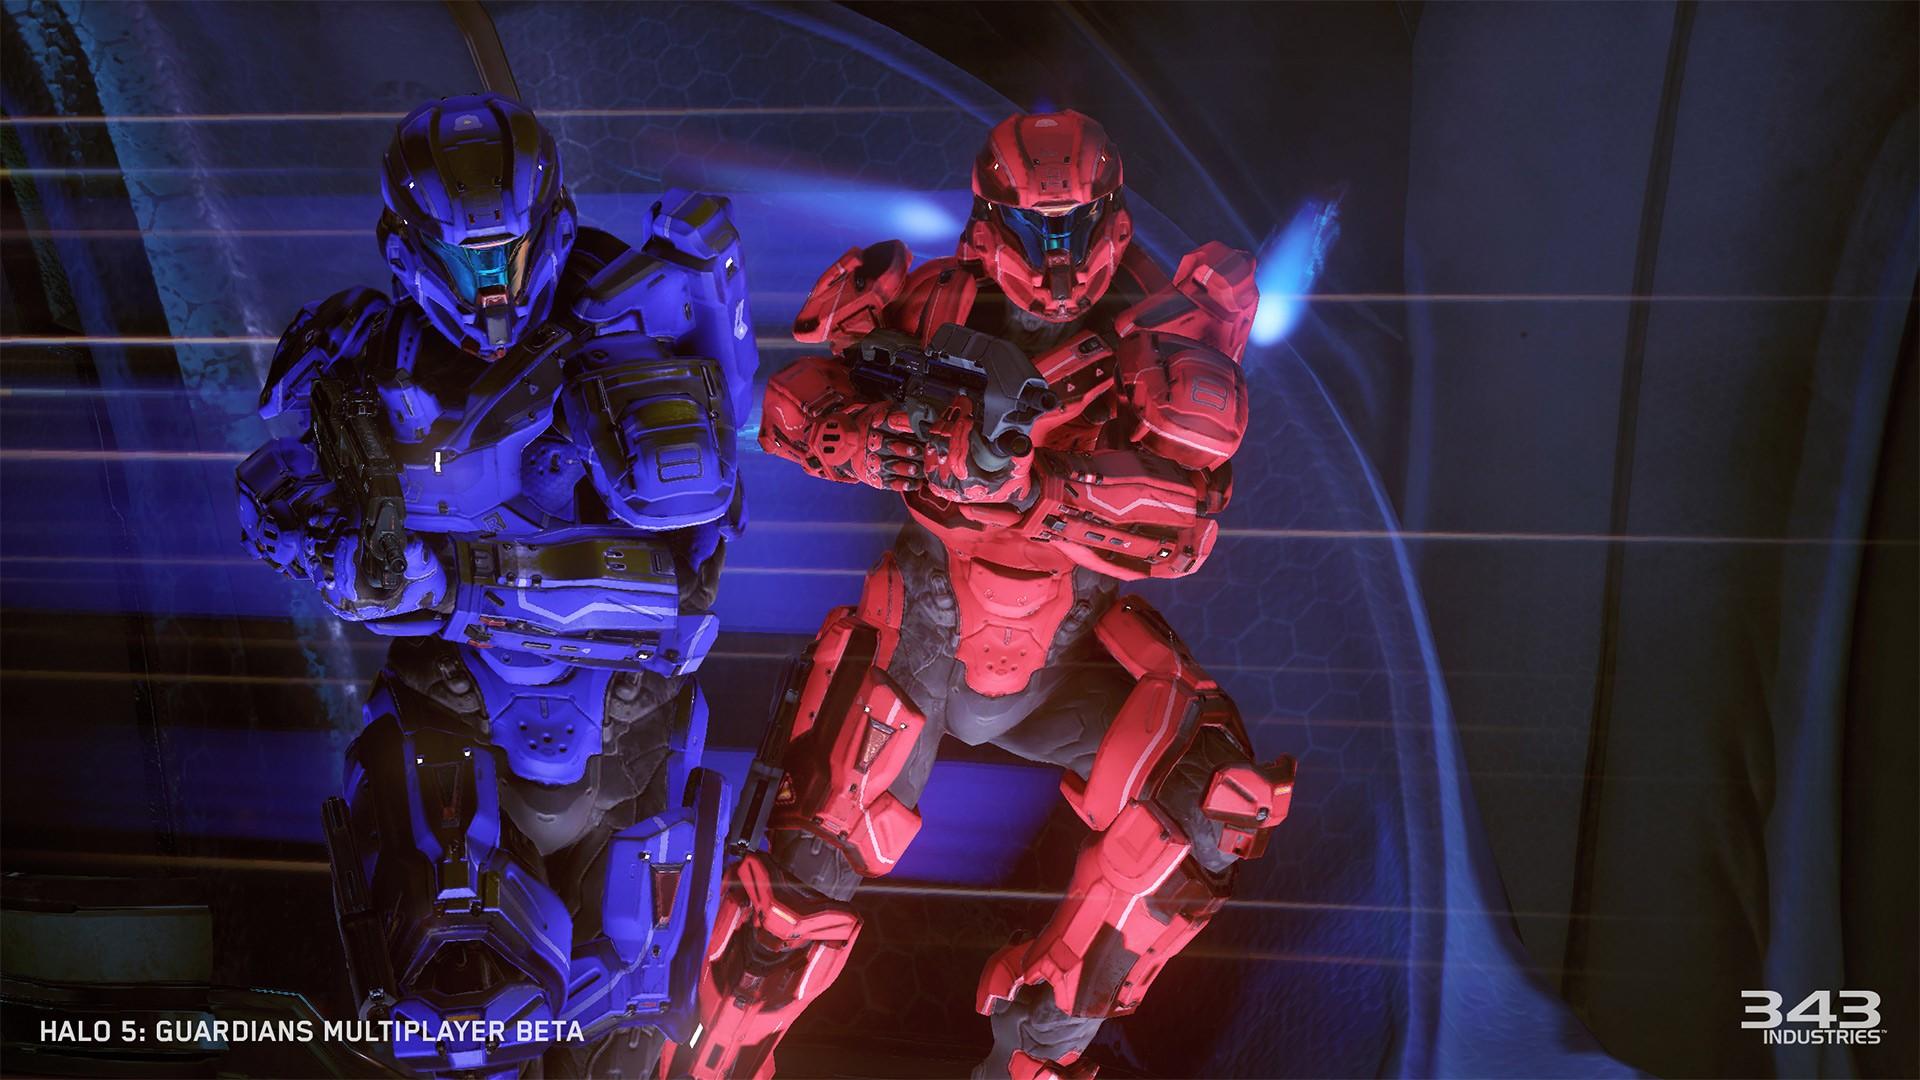 Halo 5 Beta Matchmaking Doesn't Work